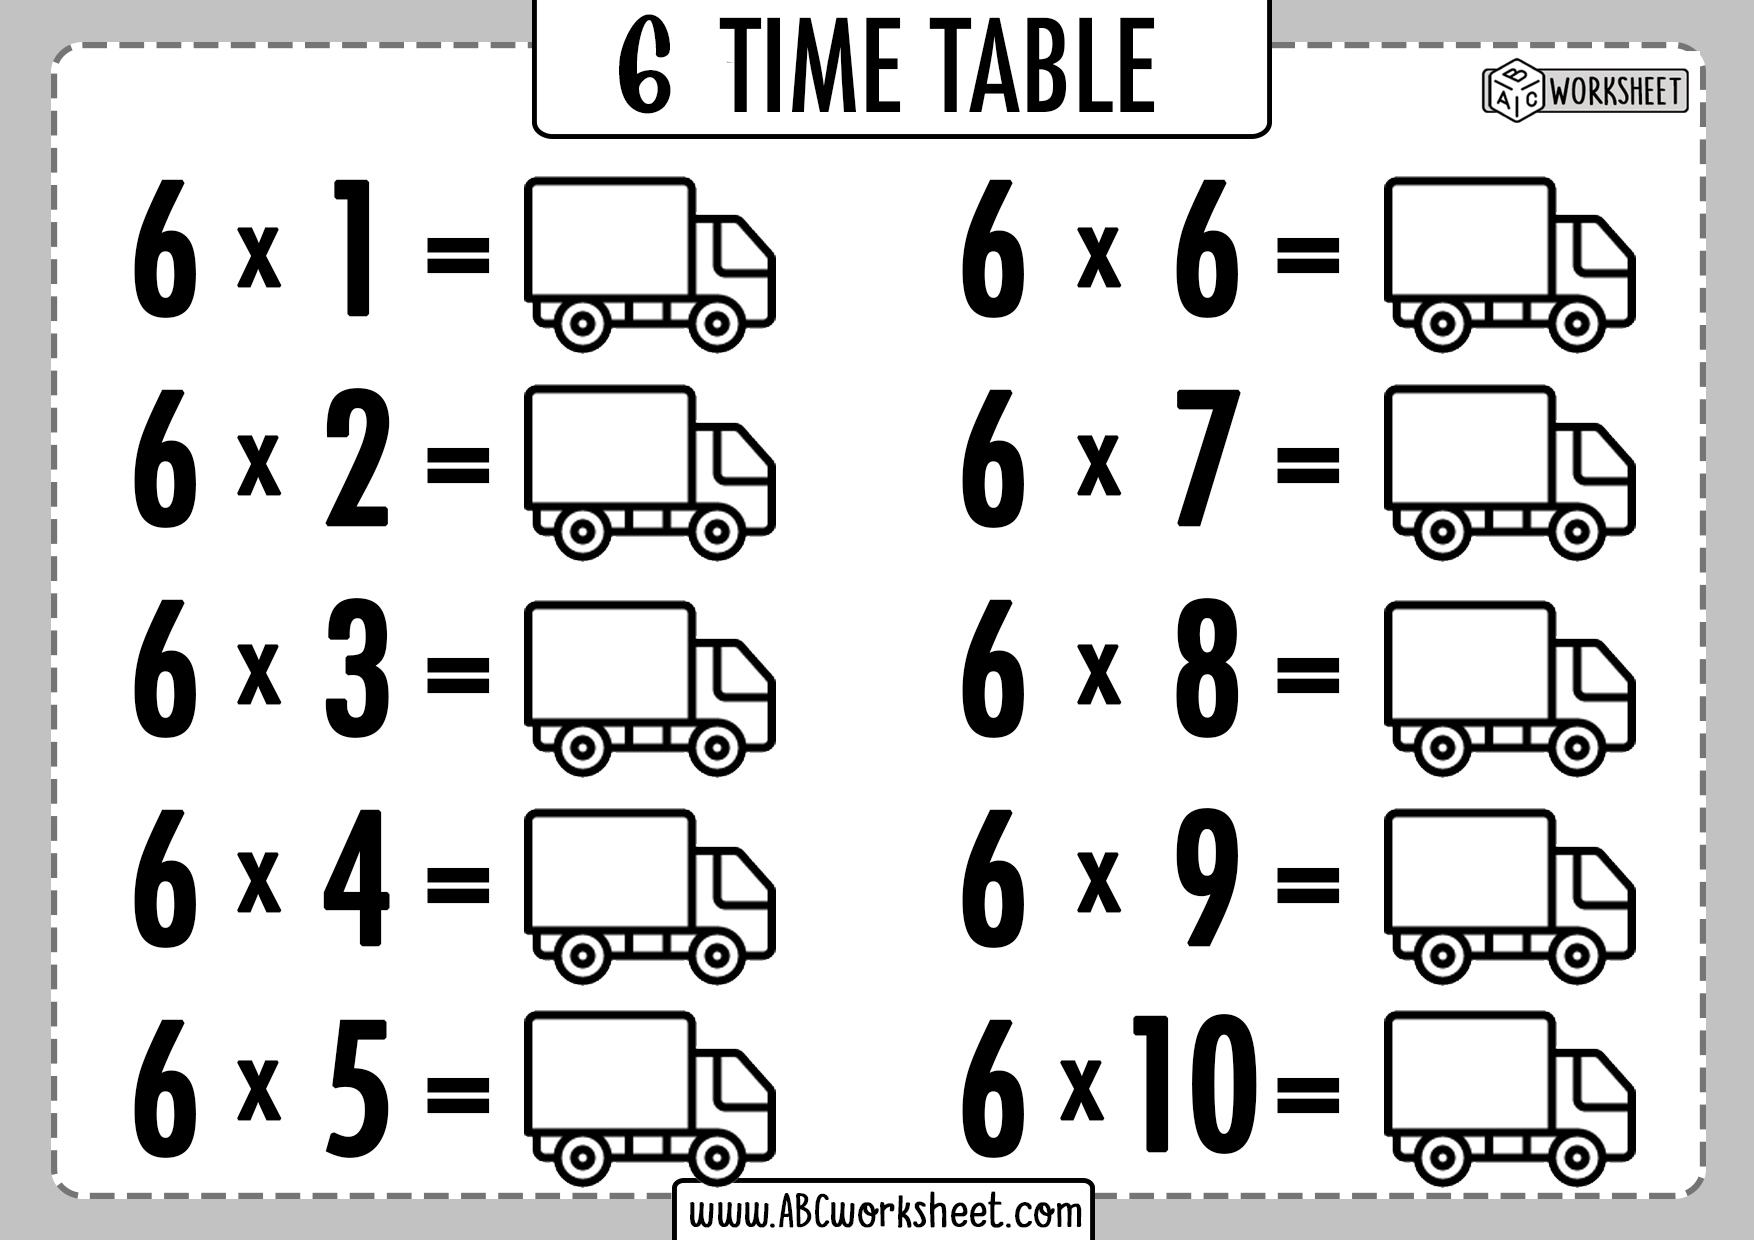 Times Tables Practice Worksheet